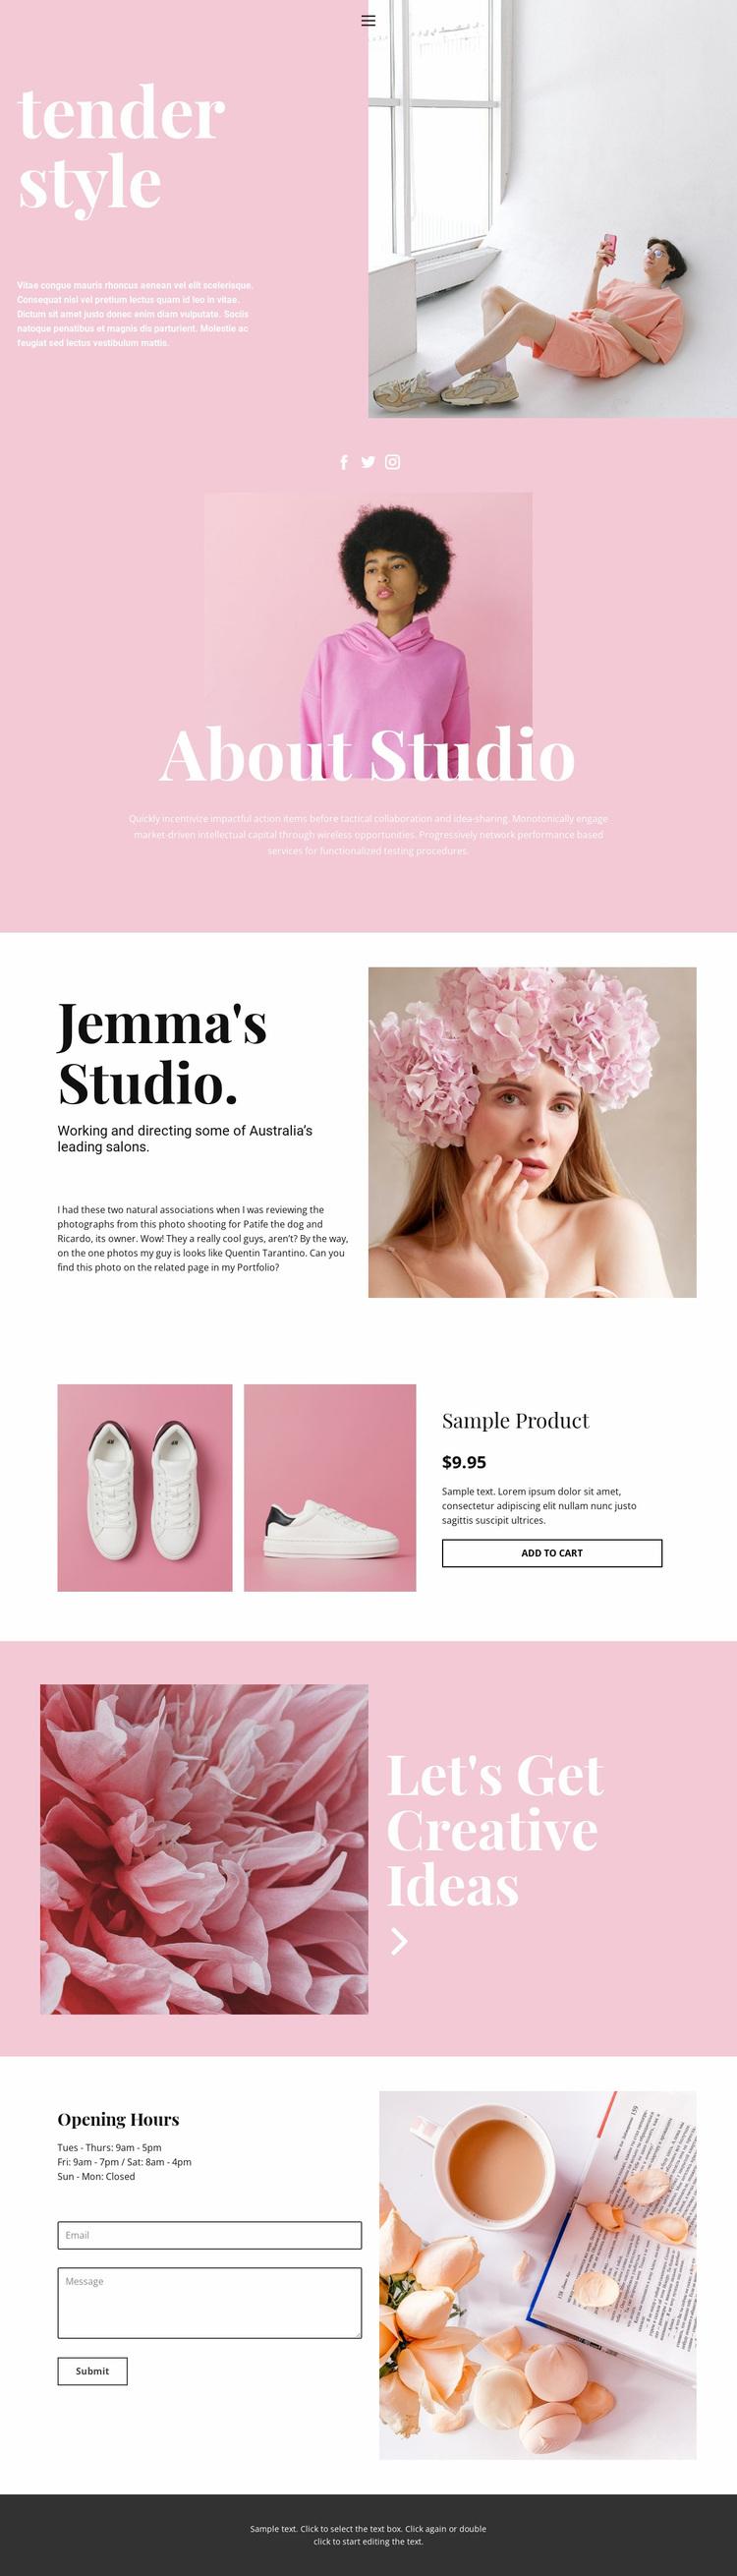 Fashion news Website Design